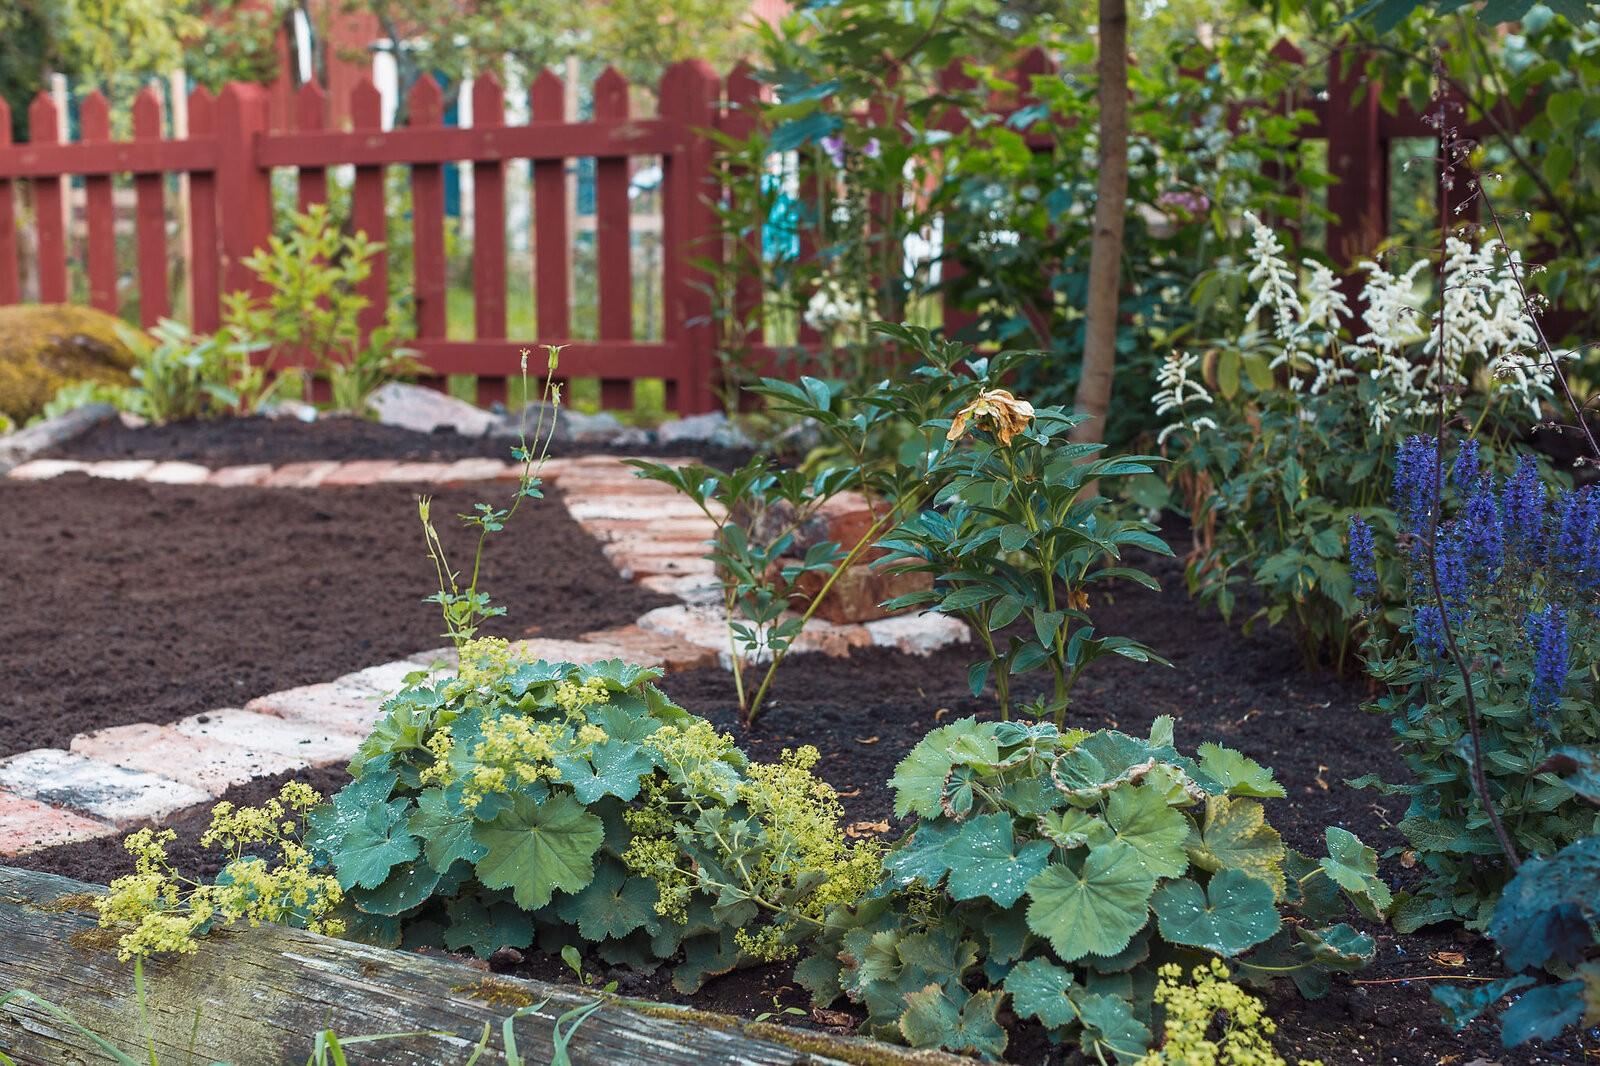 gardening_3188_Canon_EOS_5D_Mark_III_EF50mm_f-1.2L_USM.jpg